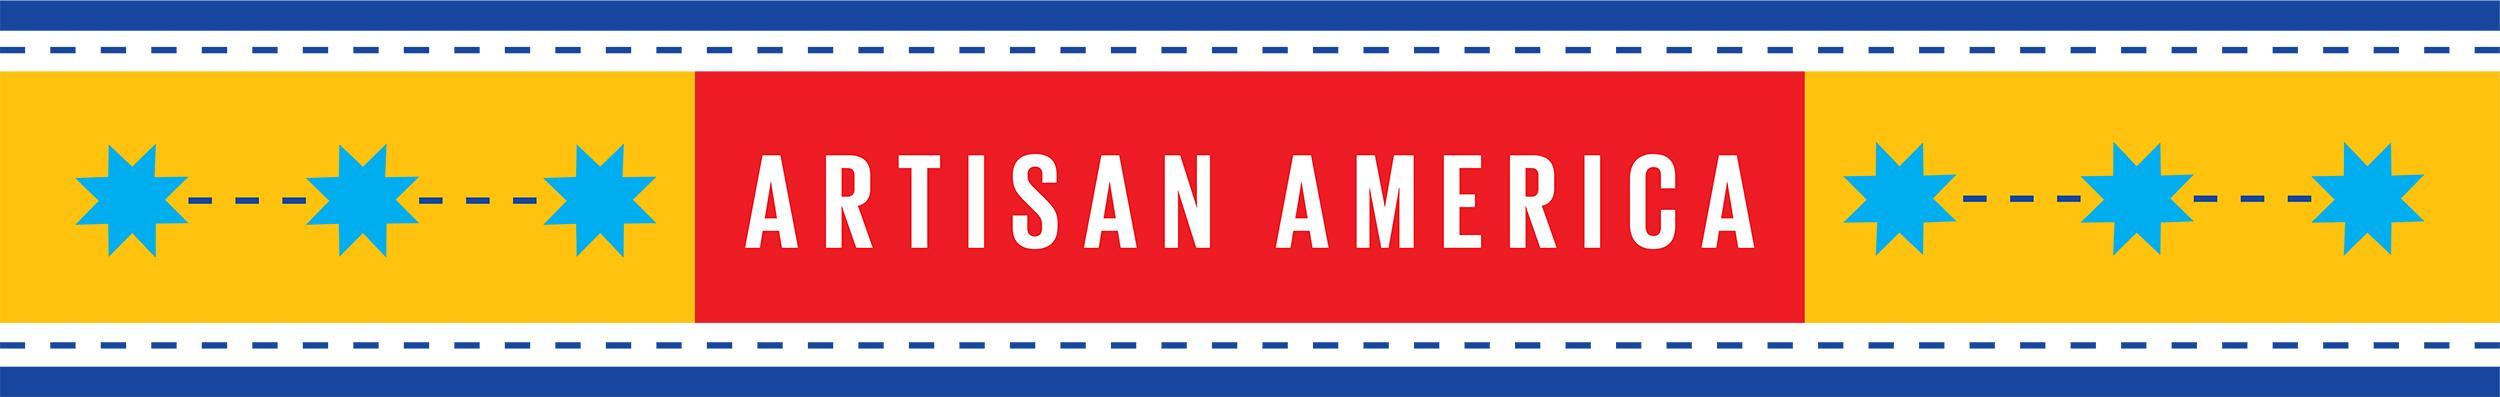 Artisan America